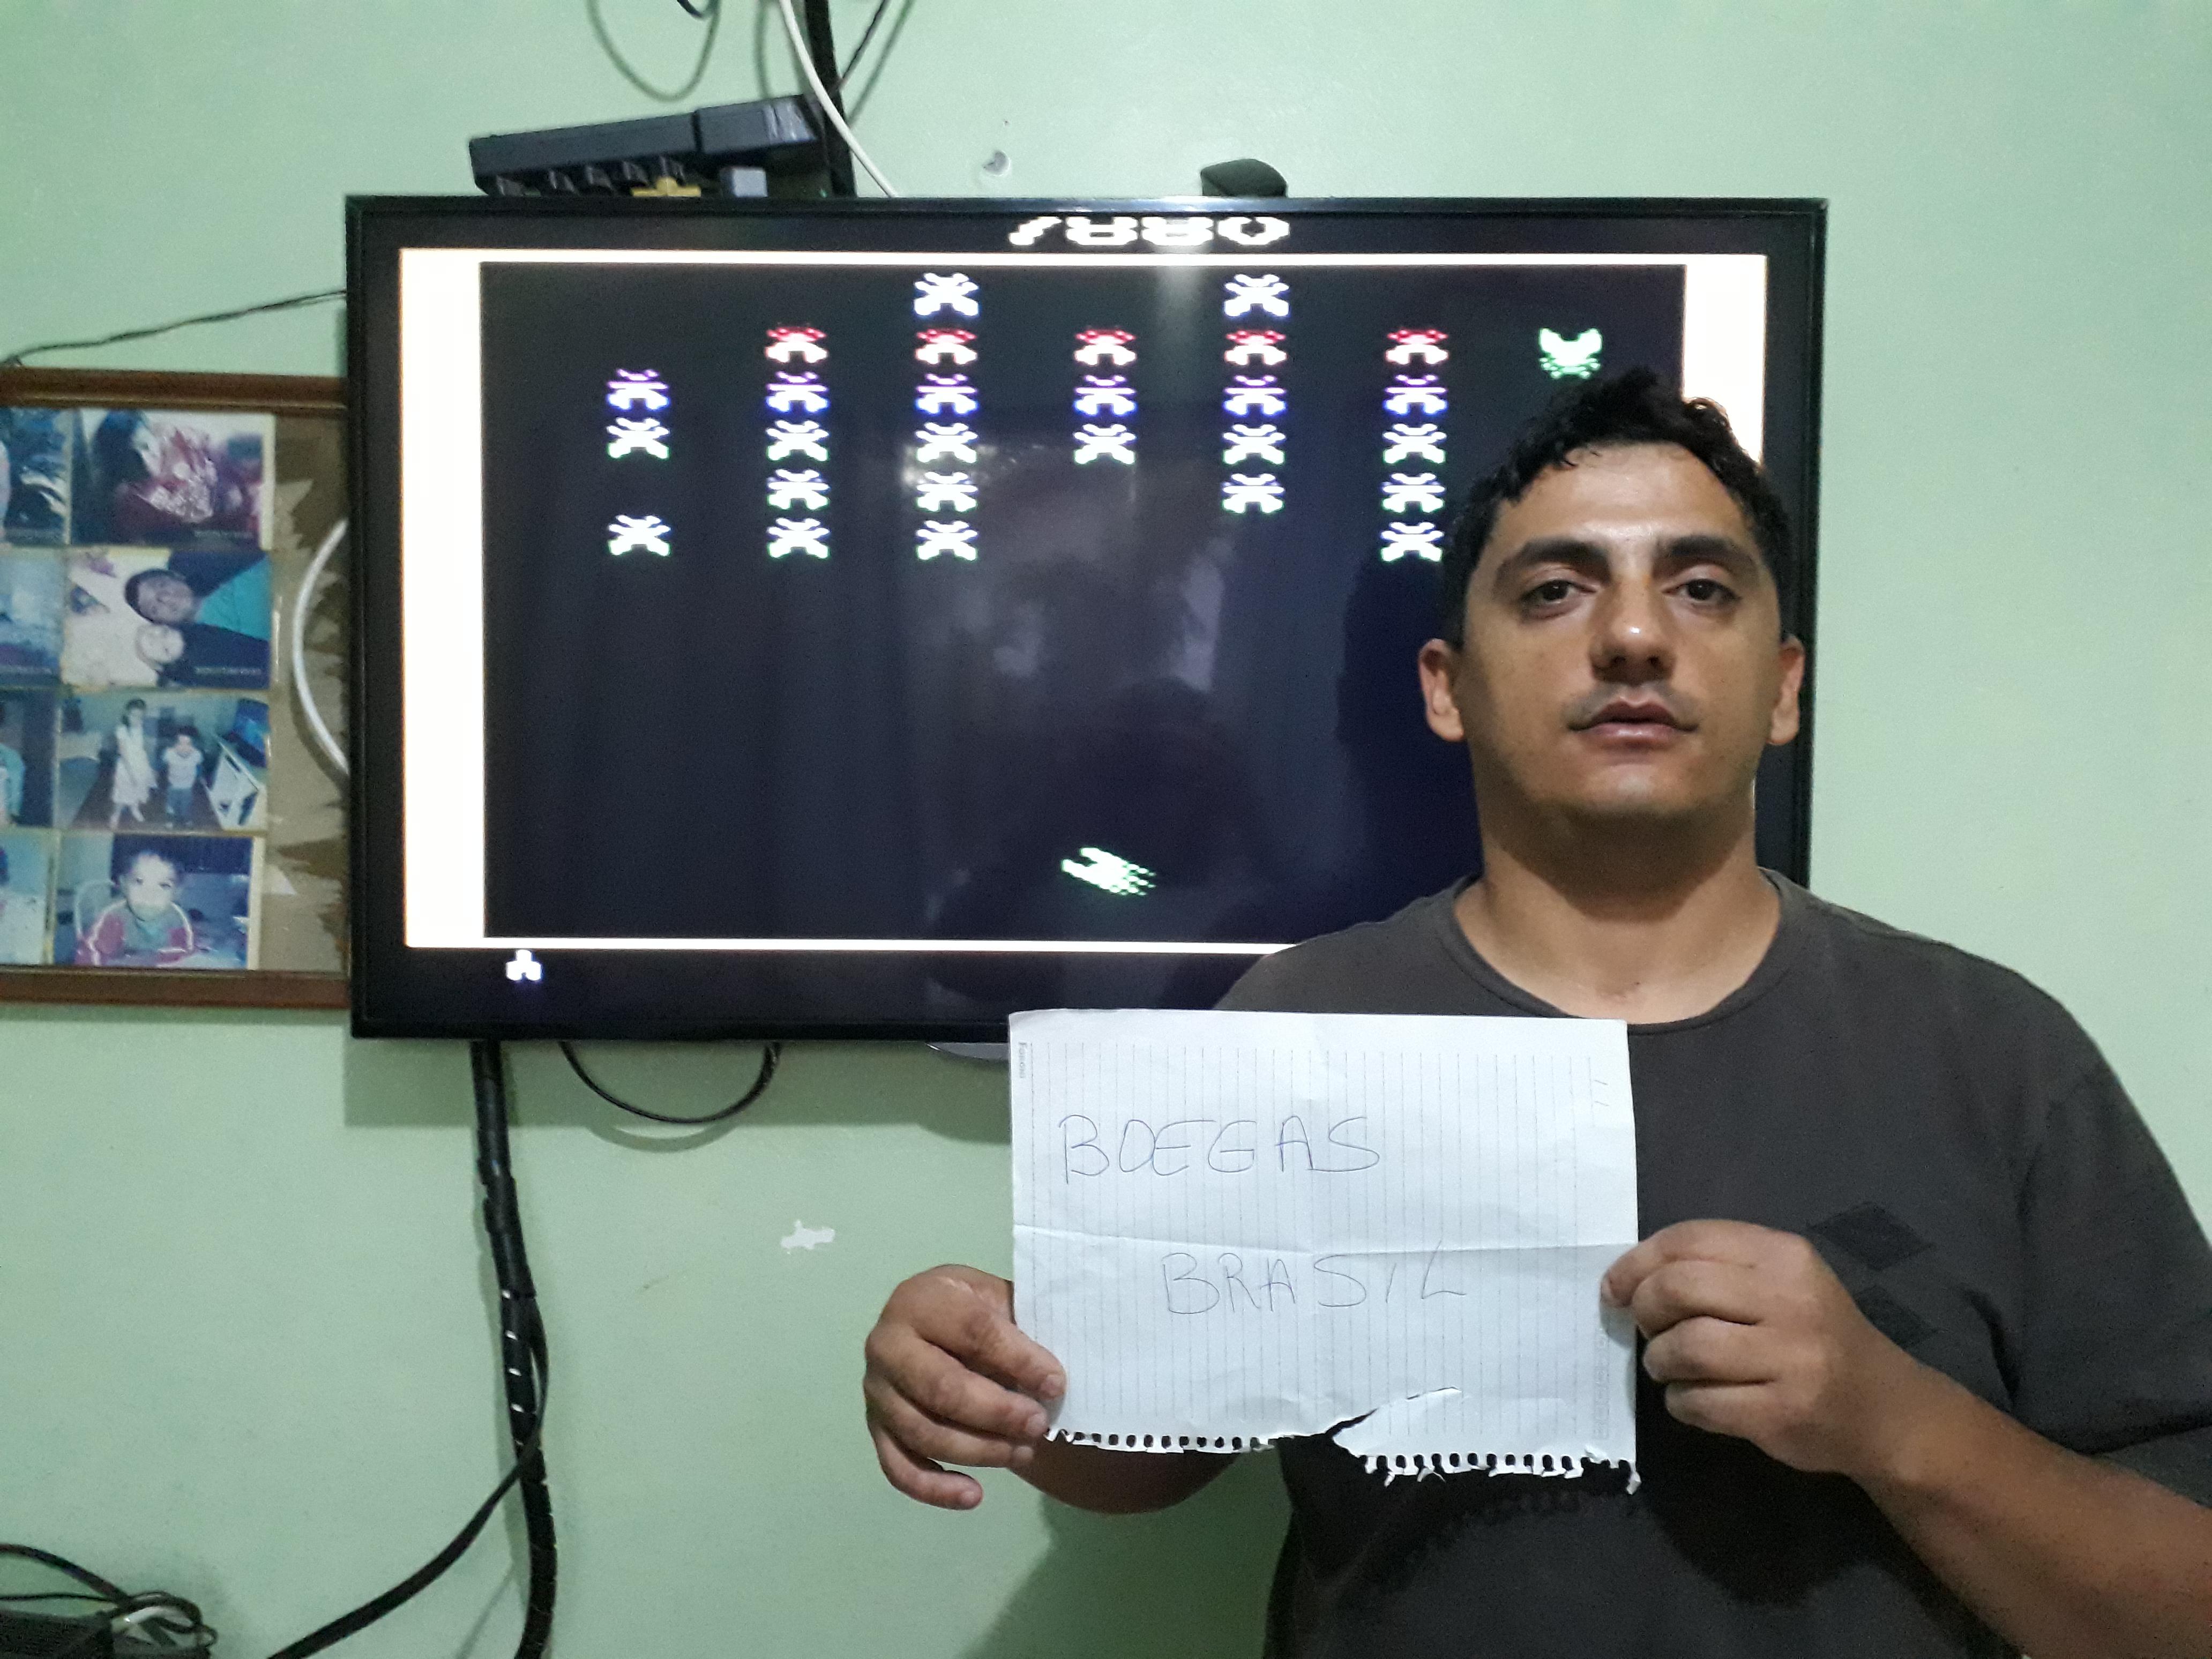 Boegas: Galaxian (Atari 2600 Emulated Novice/B Mode) 7,880 points on 2018-12-08 16:12:02